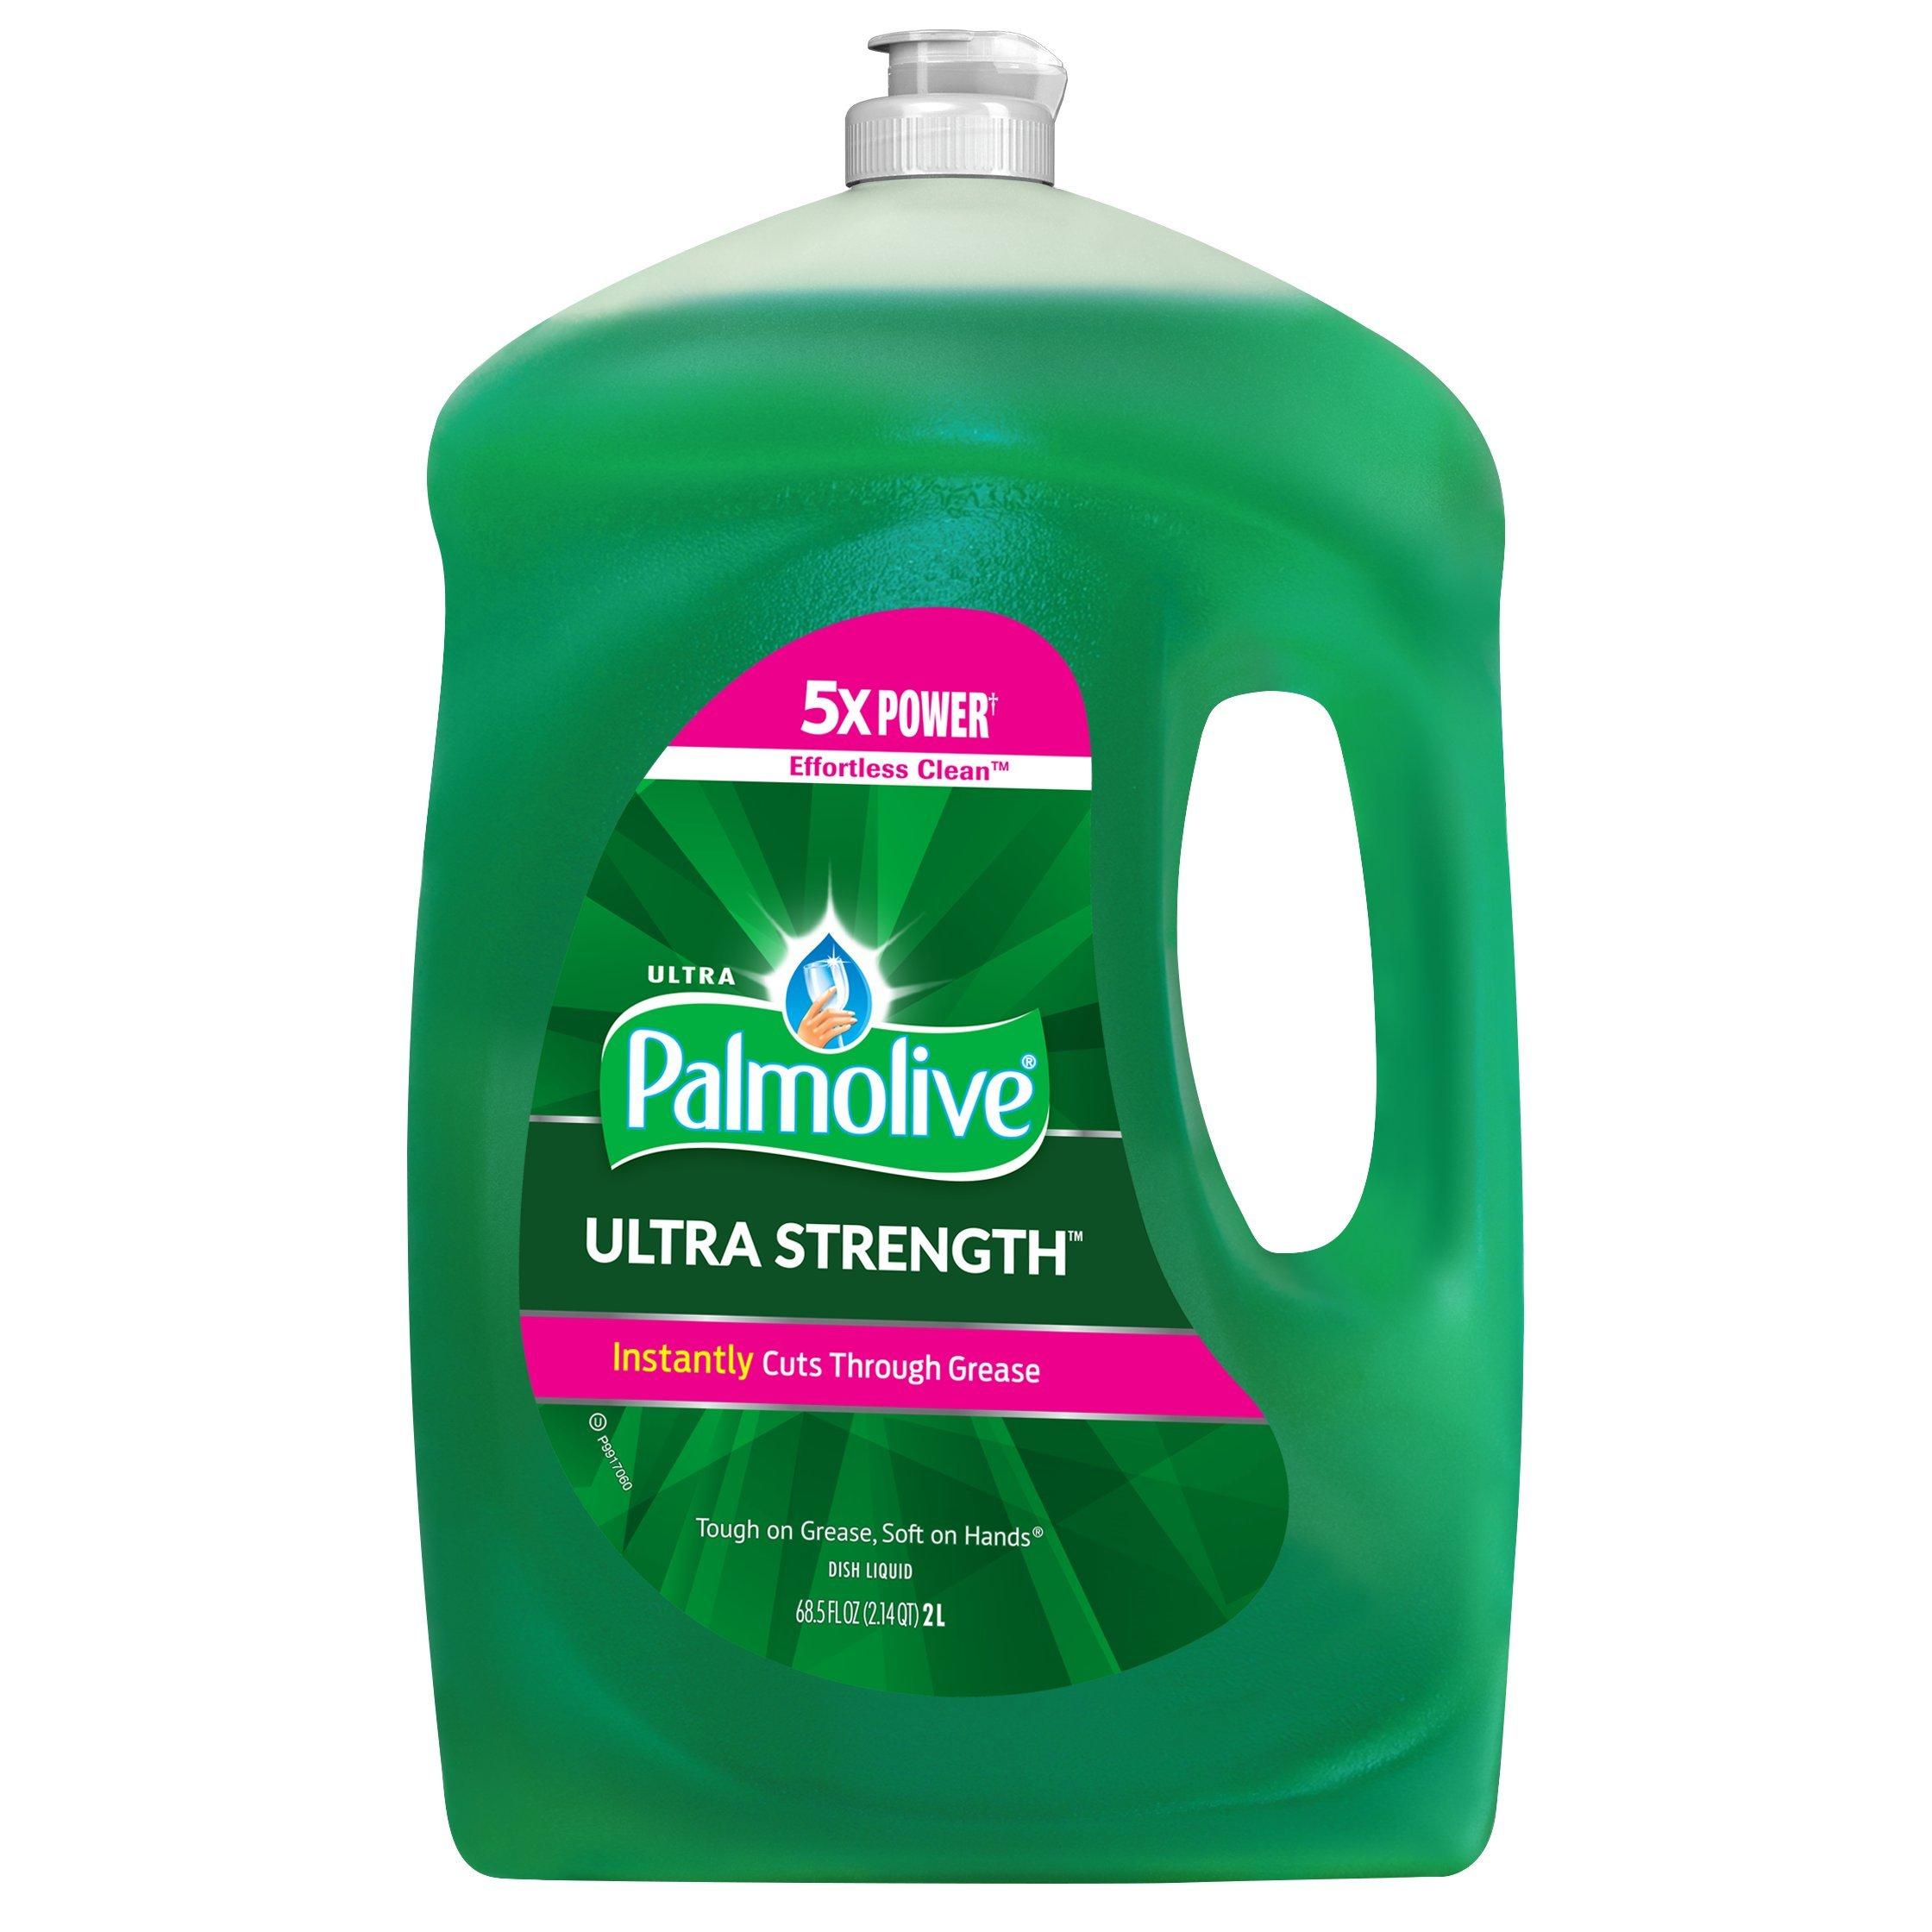 Palmolive Ultra Strength Liquid Dish Soap, Original - 68.5 Fluid Ounce (4 Pack)